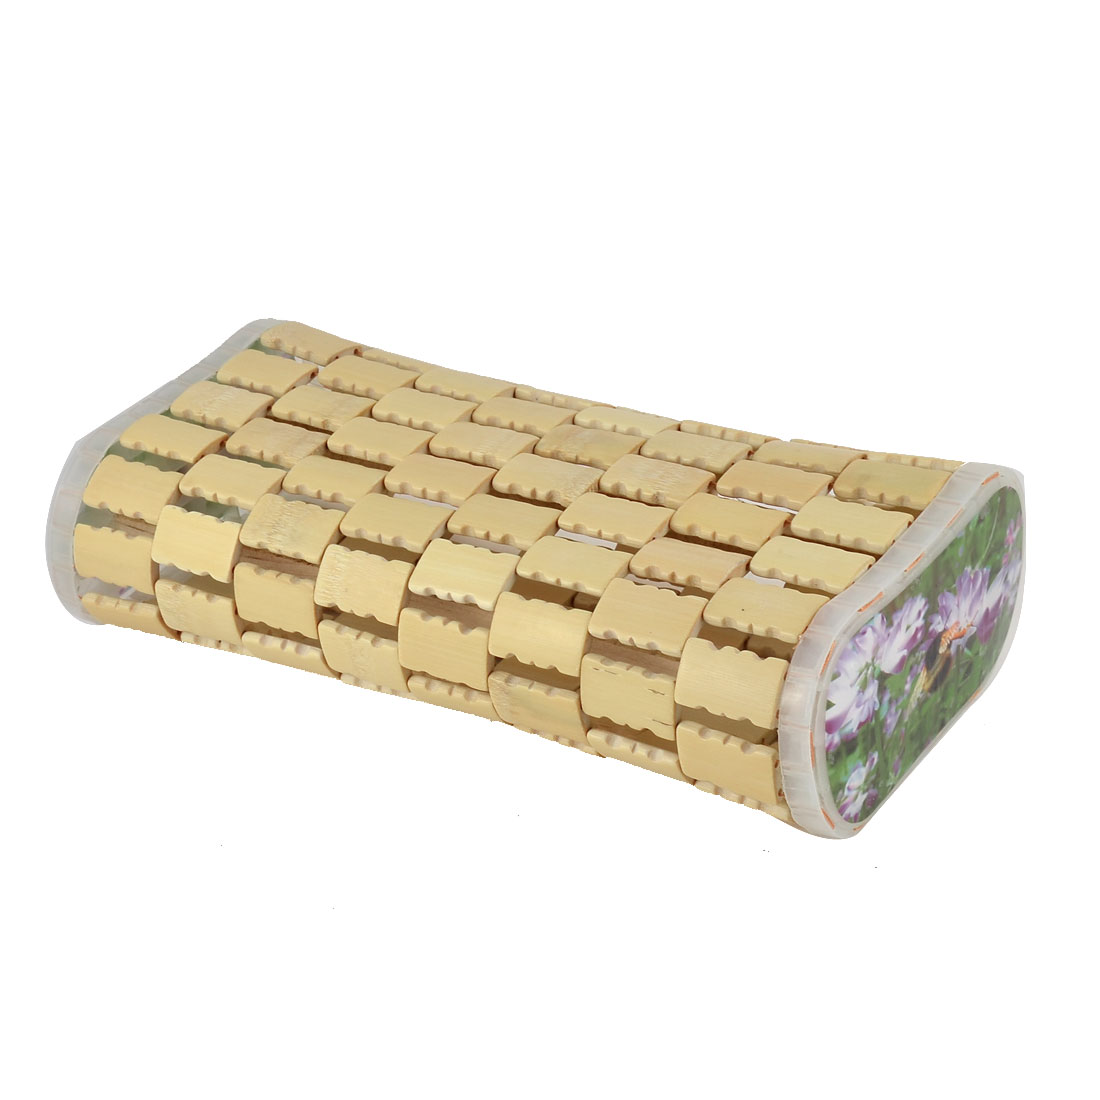 Bamboo Mesh Designed Plastic Rim Breathable Summer Neck Pillow 7.5 cm Height